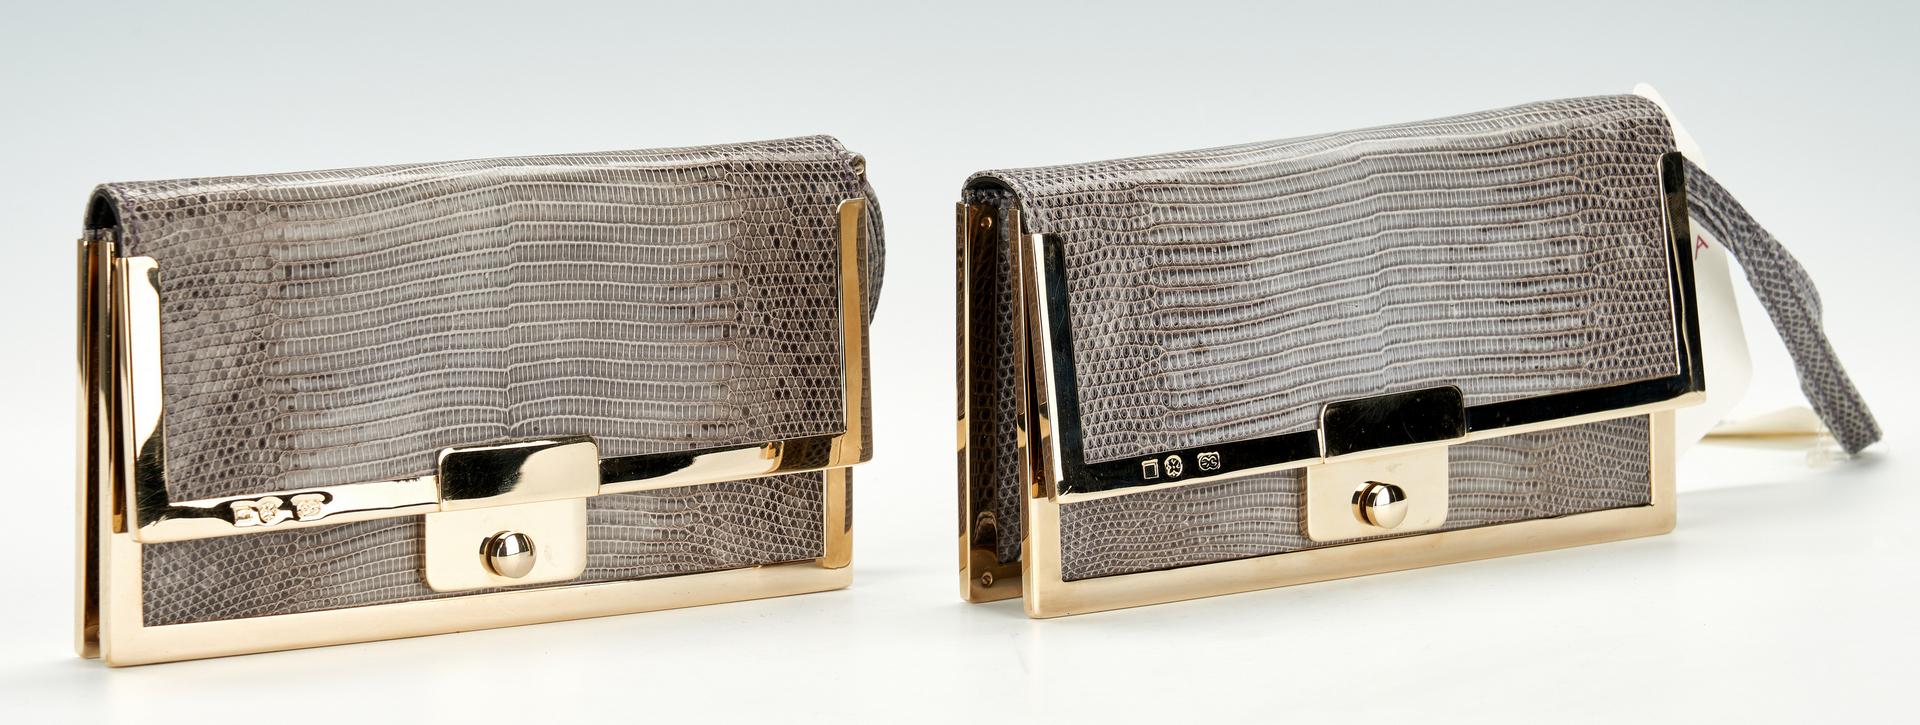 Lot 1023: 5 Escada Designer Items, incl. Margaretha Ley